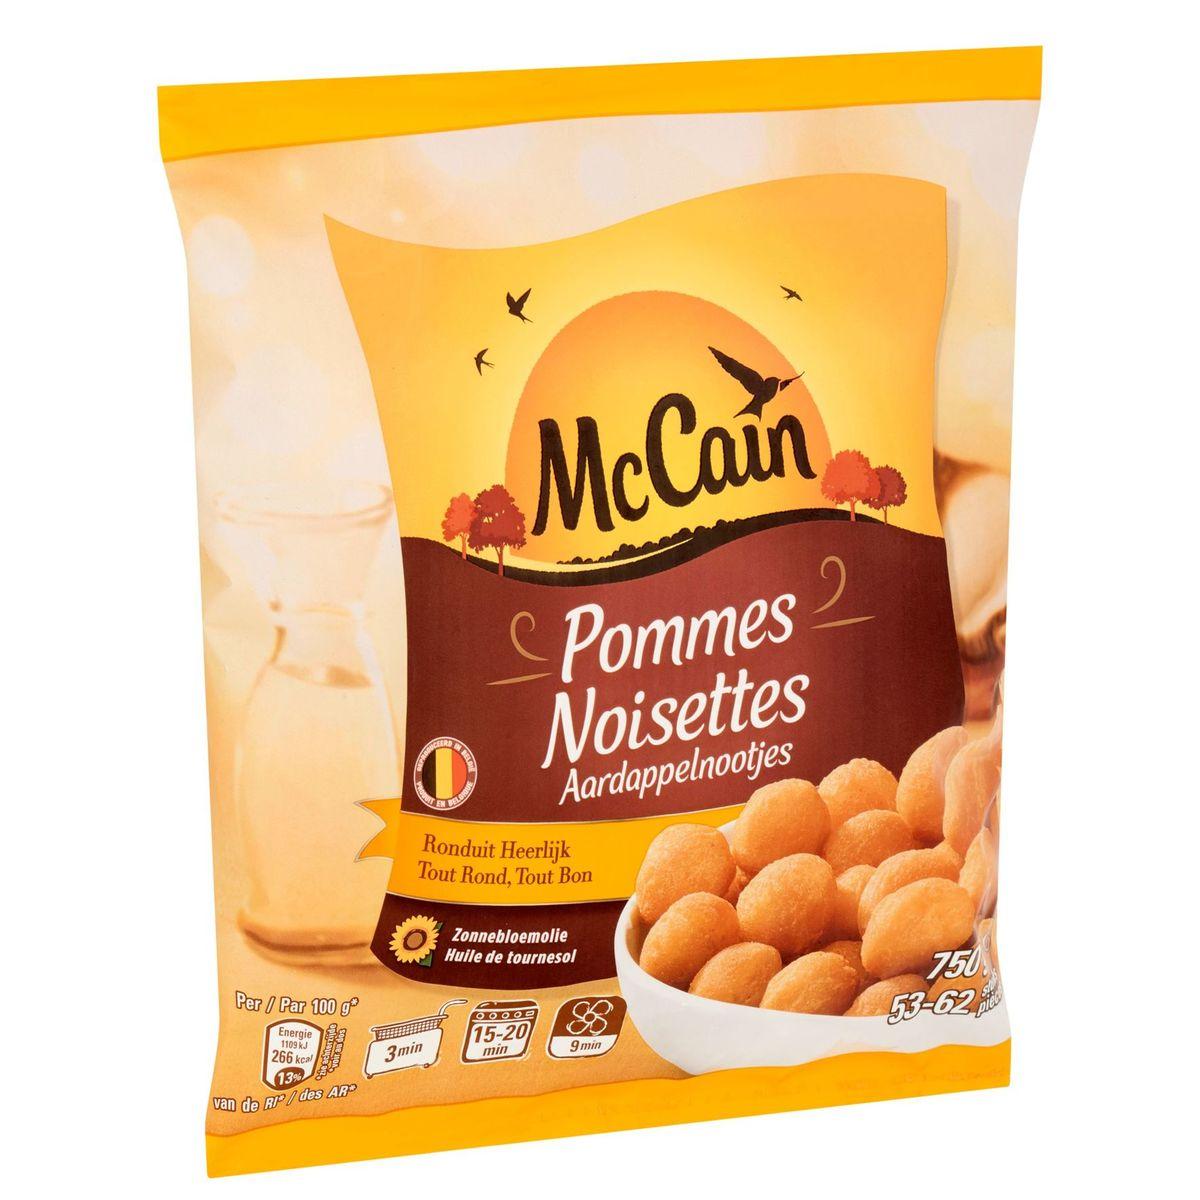 McCain Aardappelnootjes 750 g